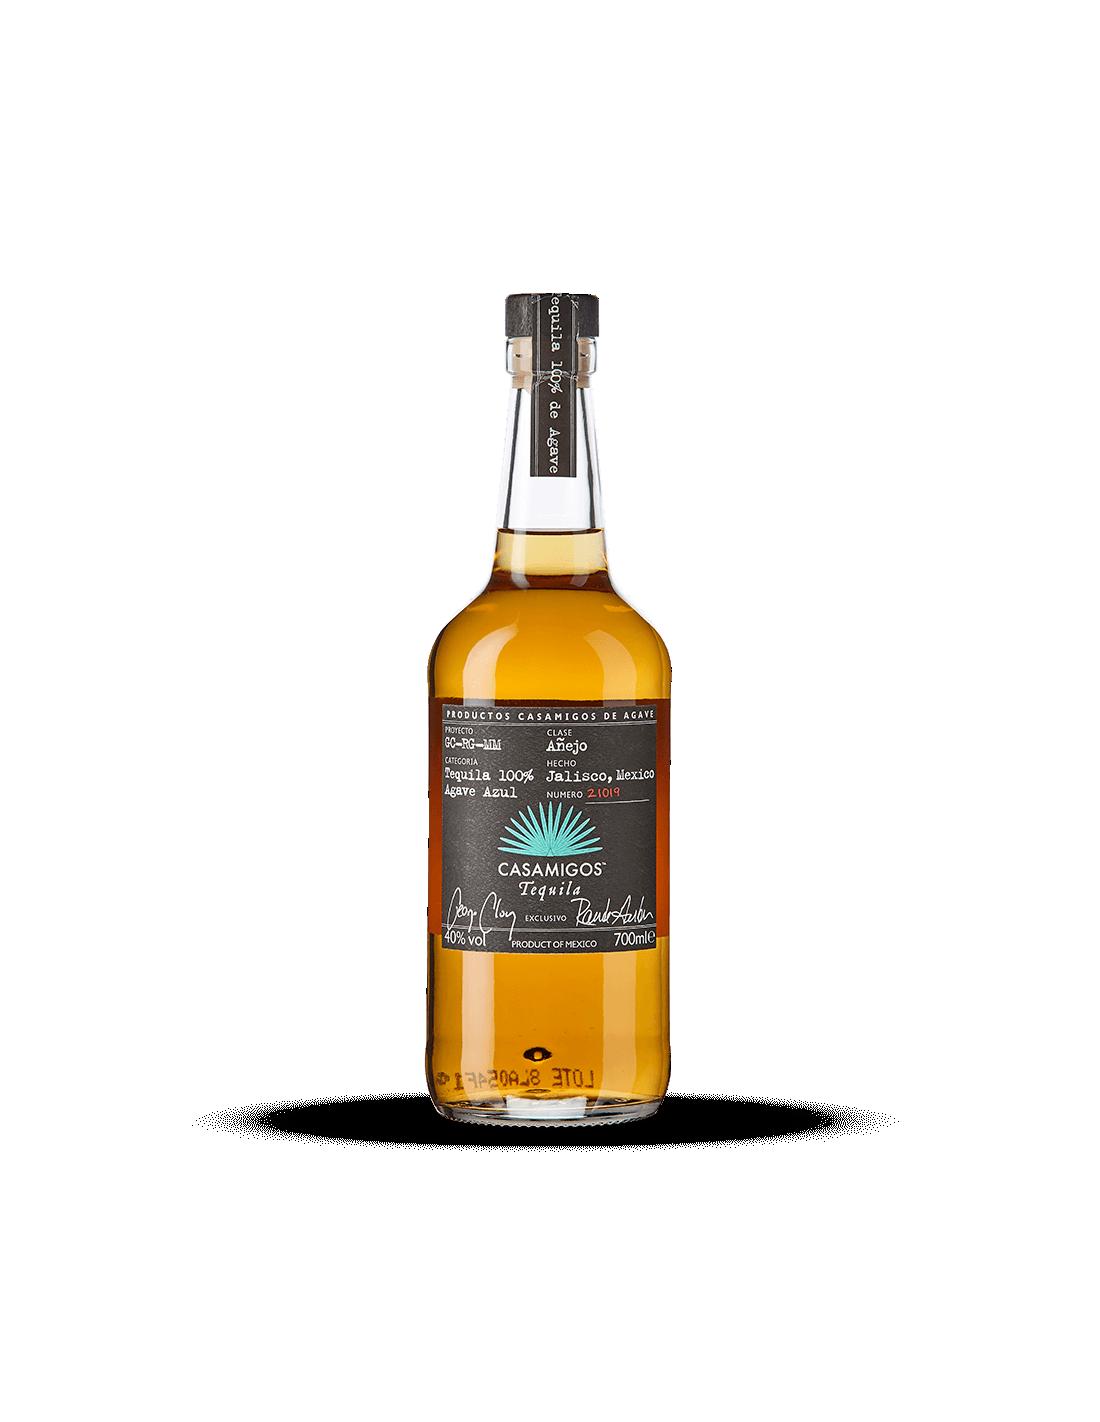 Tequila Casamigos Anejo, 40% alc., 0.7L, Mexic